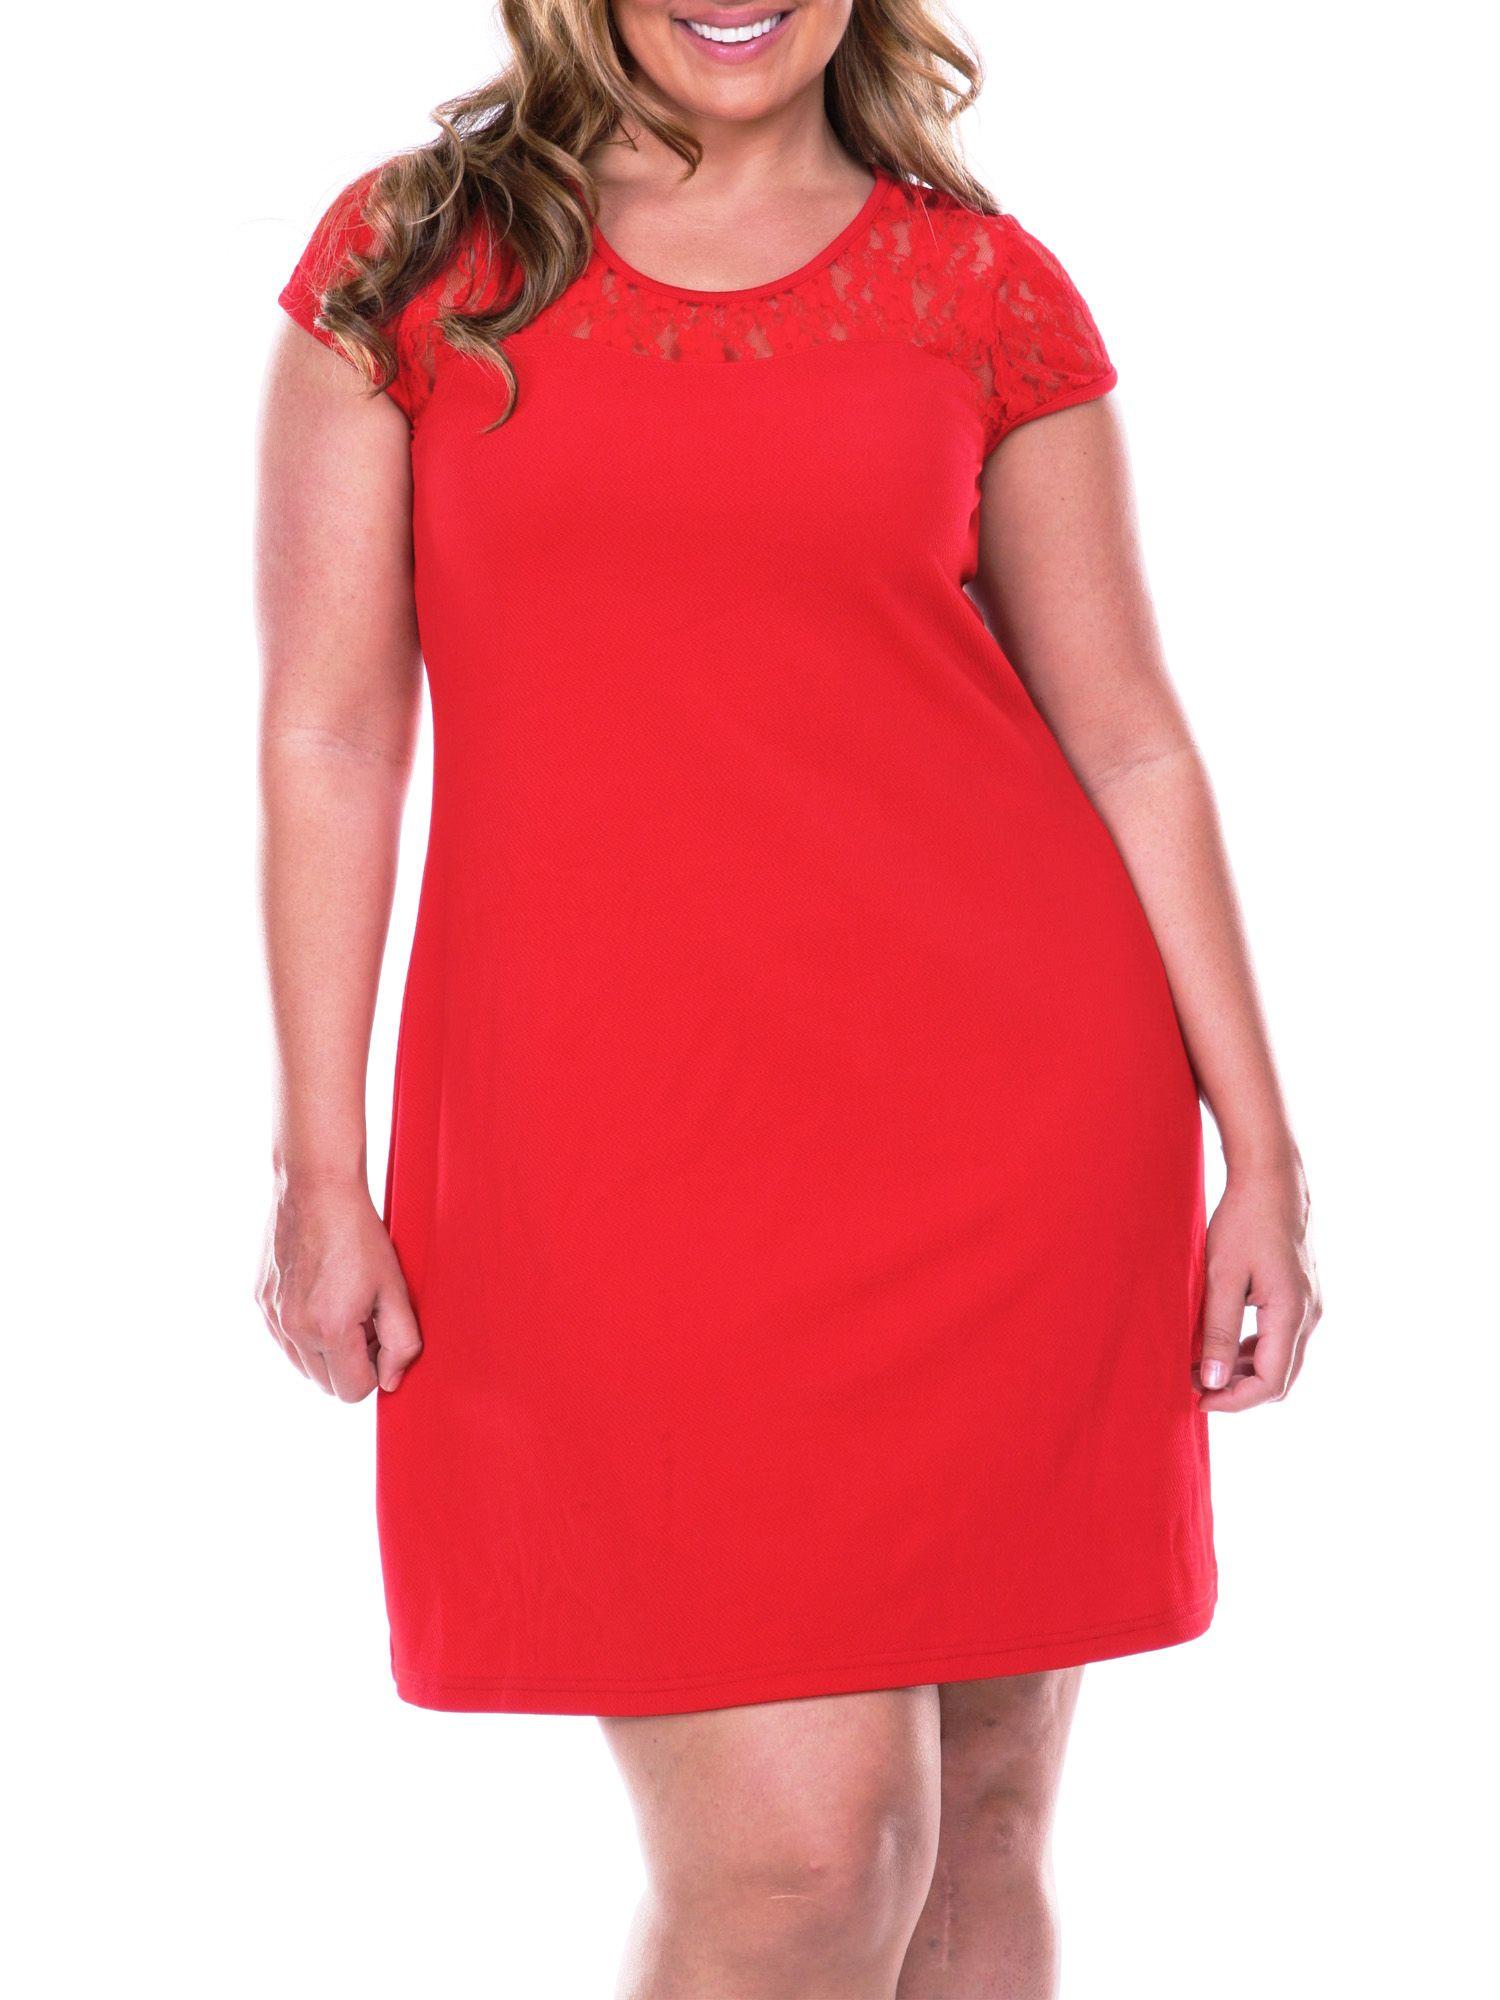 White Mark White Mark Women S Plus Size Lace Cutout Dress Walmart Com Lace Cutout Dress Capped Sleeve Dress Lace Cutout [ 2000 x 1500 Pixel ]